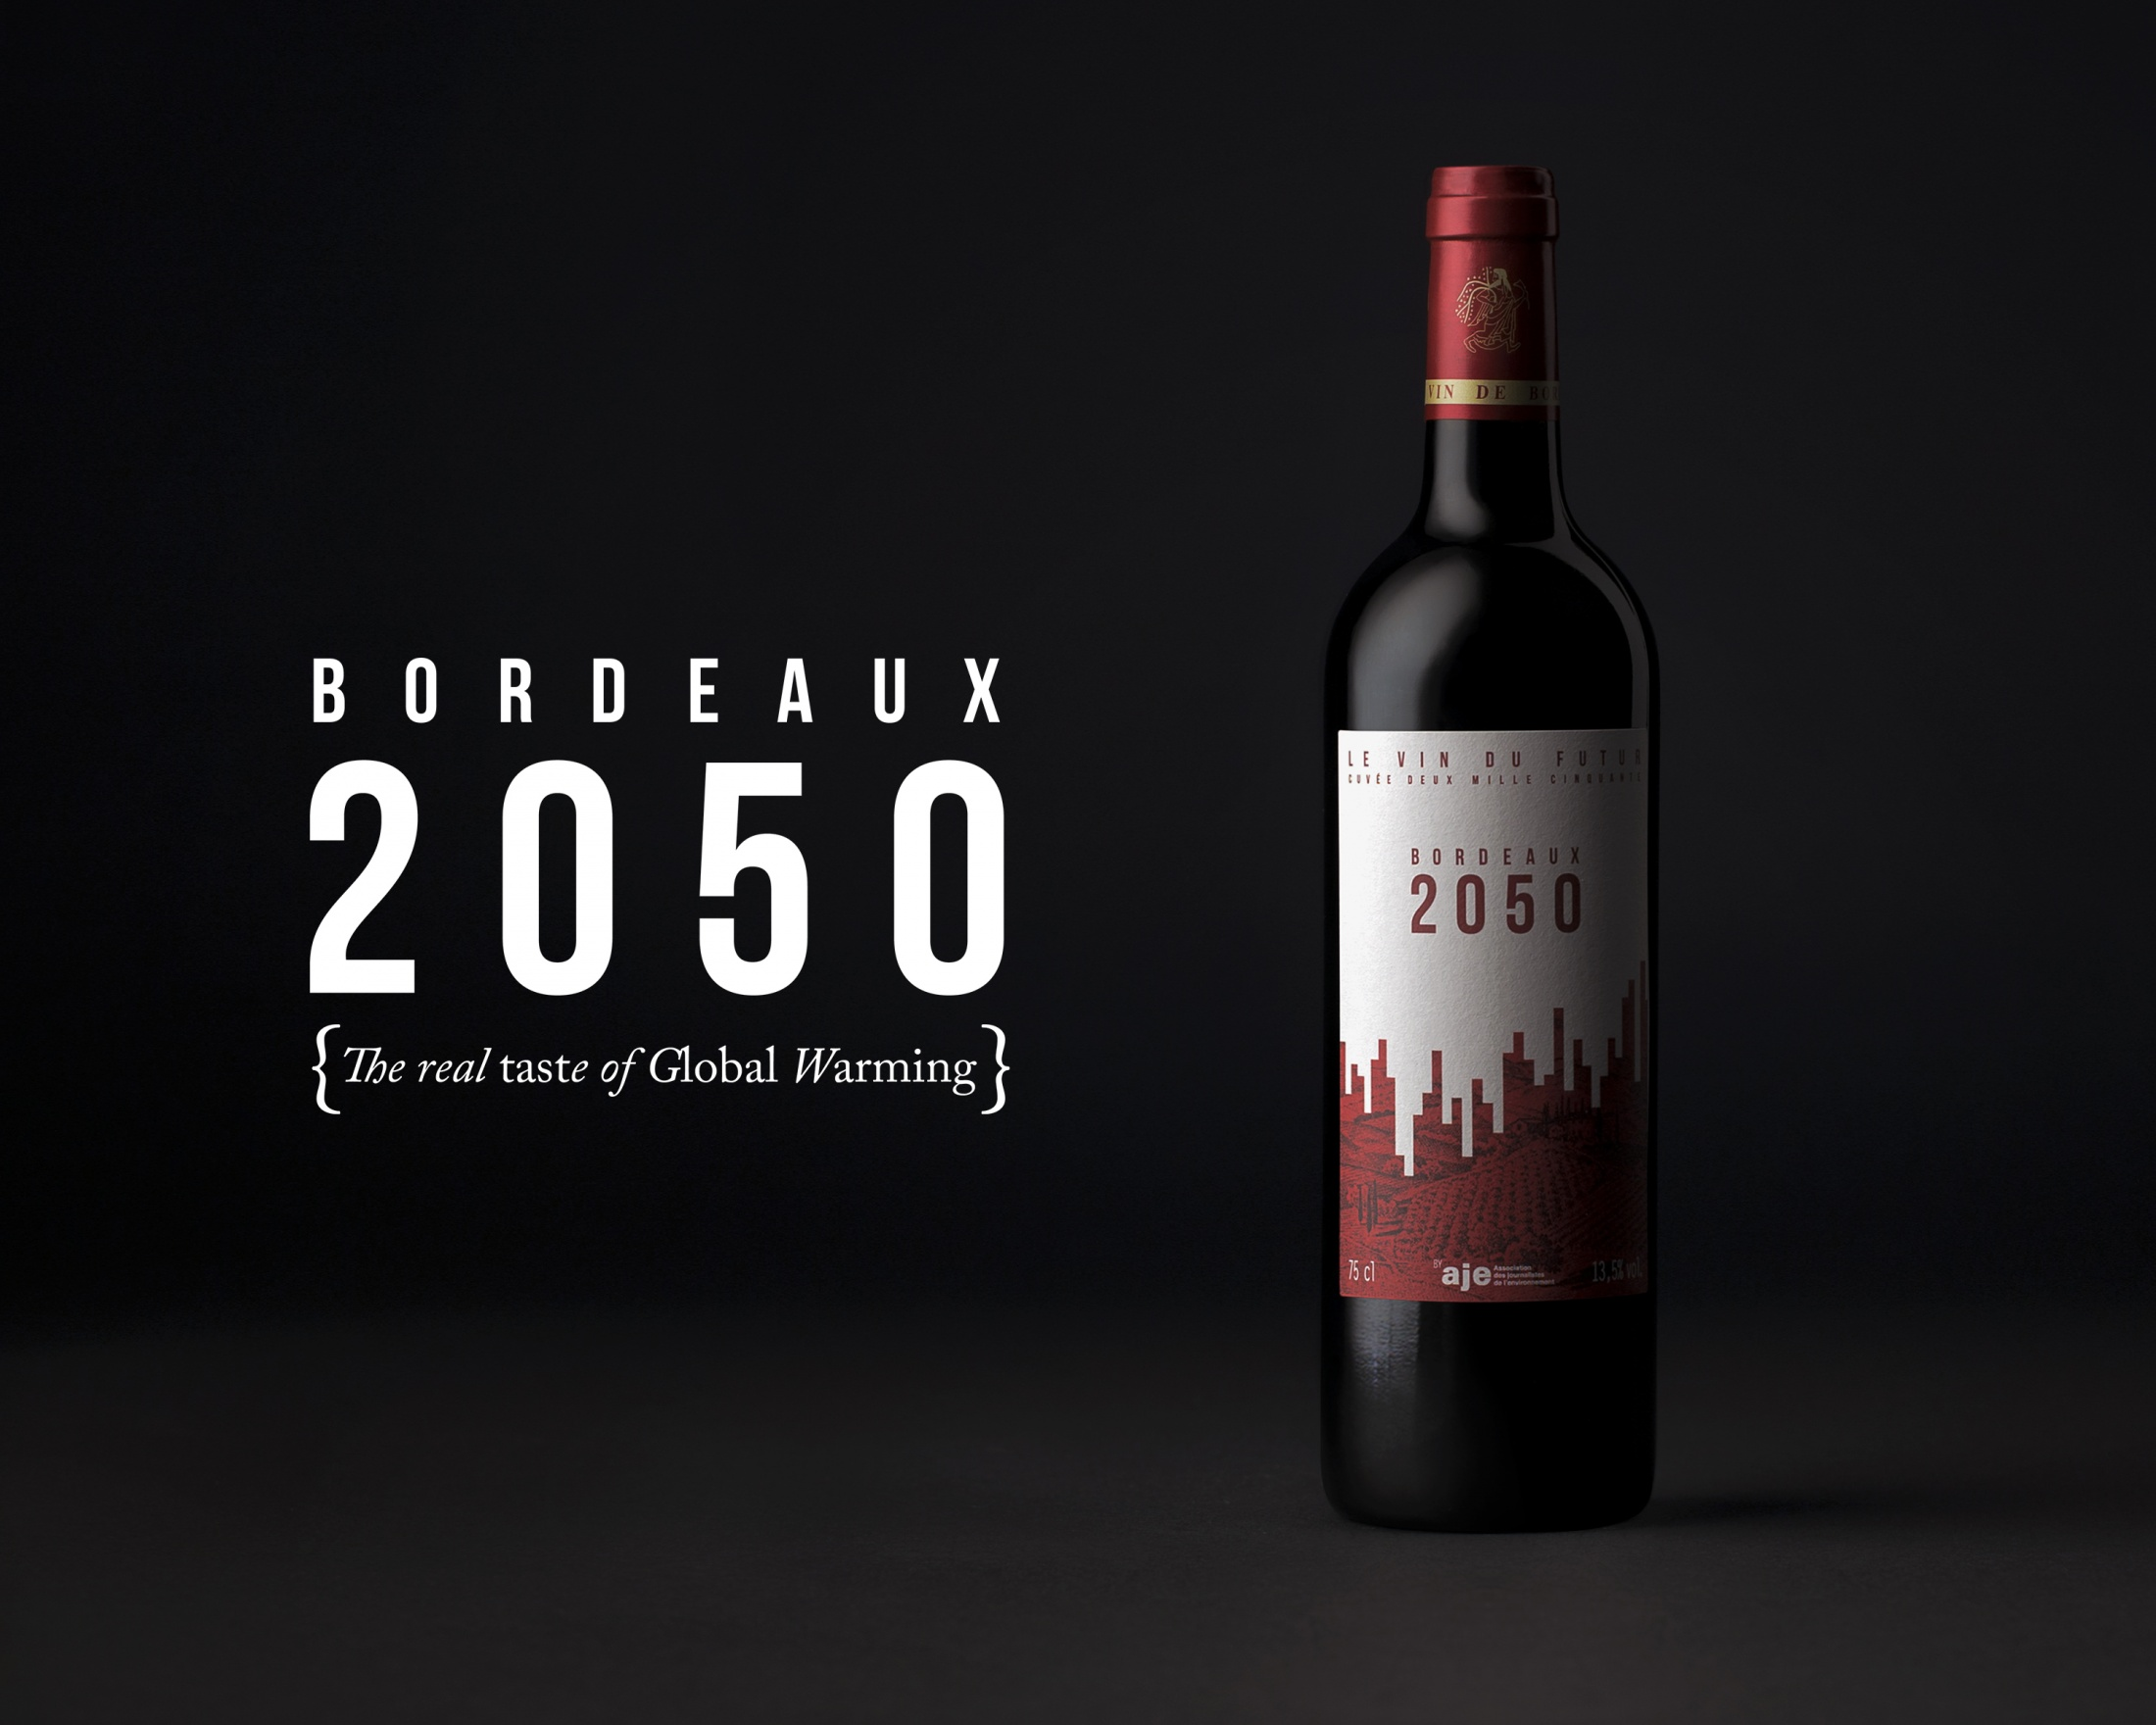 Thumbnail for Bordeaux 2050